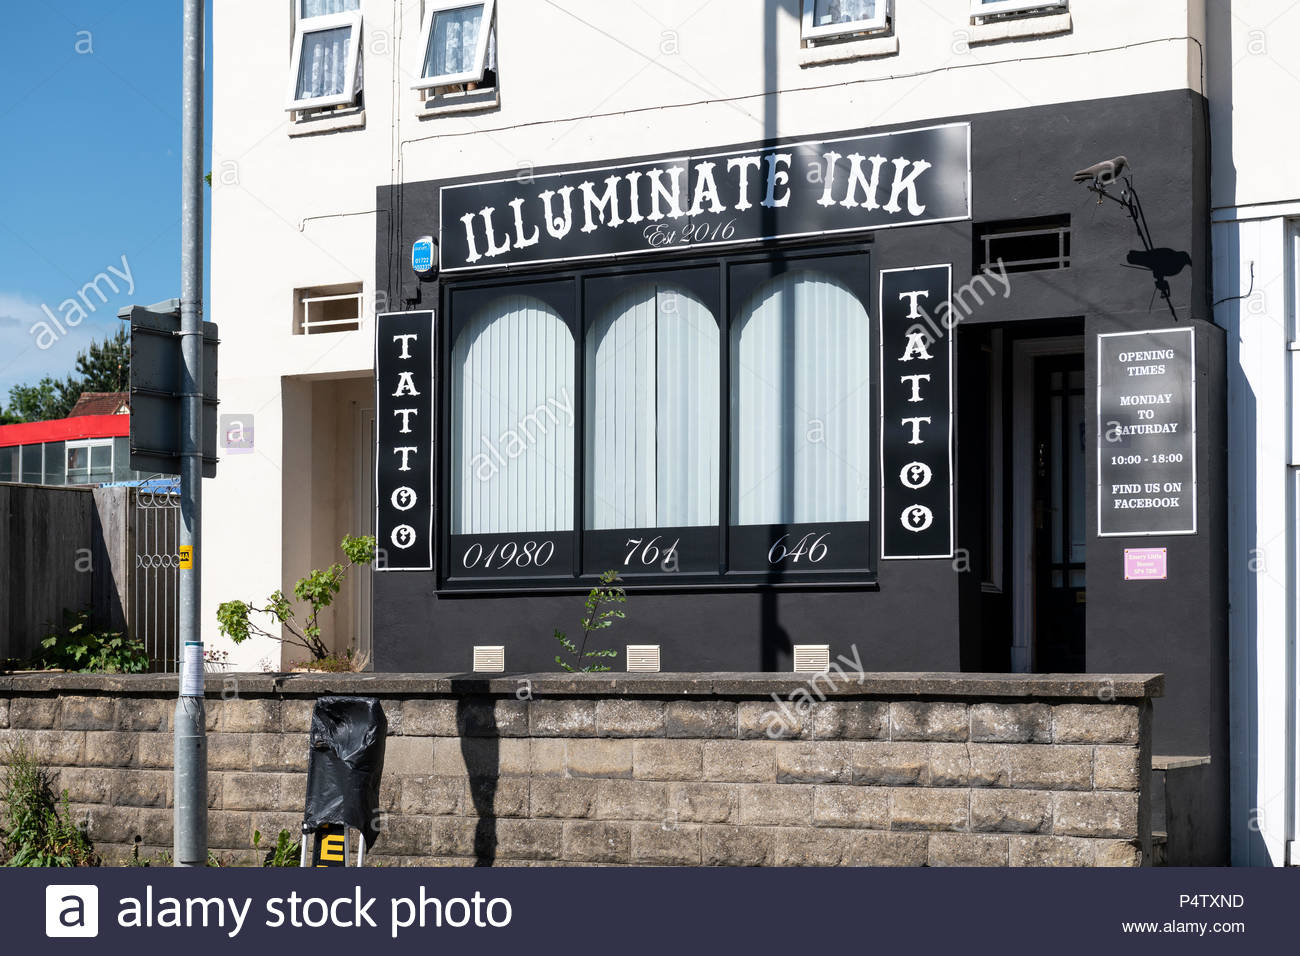 Illuminate Ink, The Centre, tattoo parlor, Amesbury, Wiltshire, England, UK - Stock Image